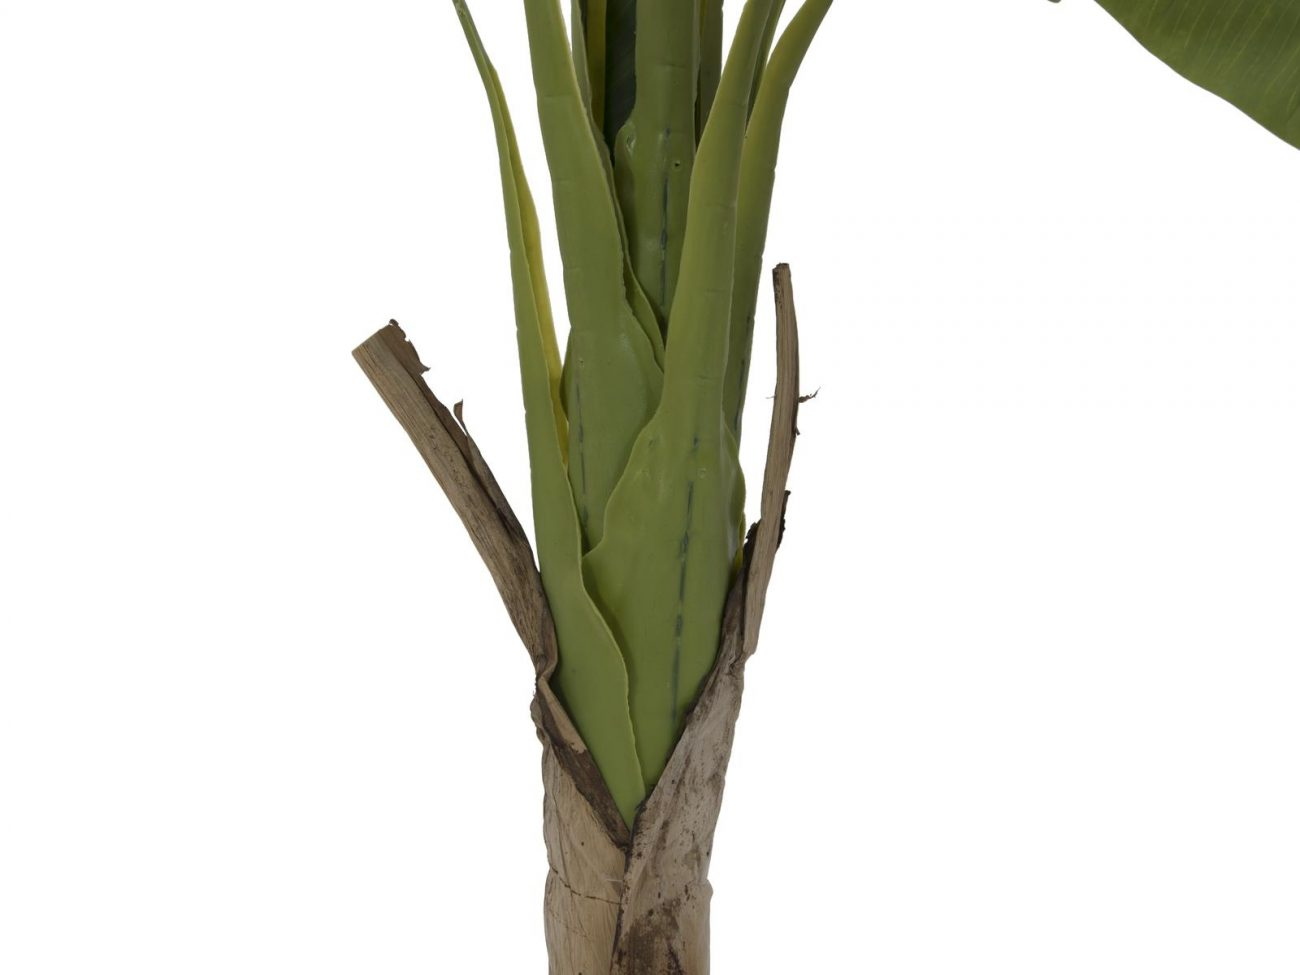 bananier-artificiel-matiere-synthetique